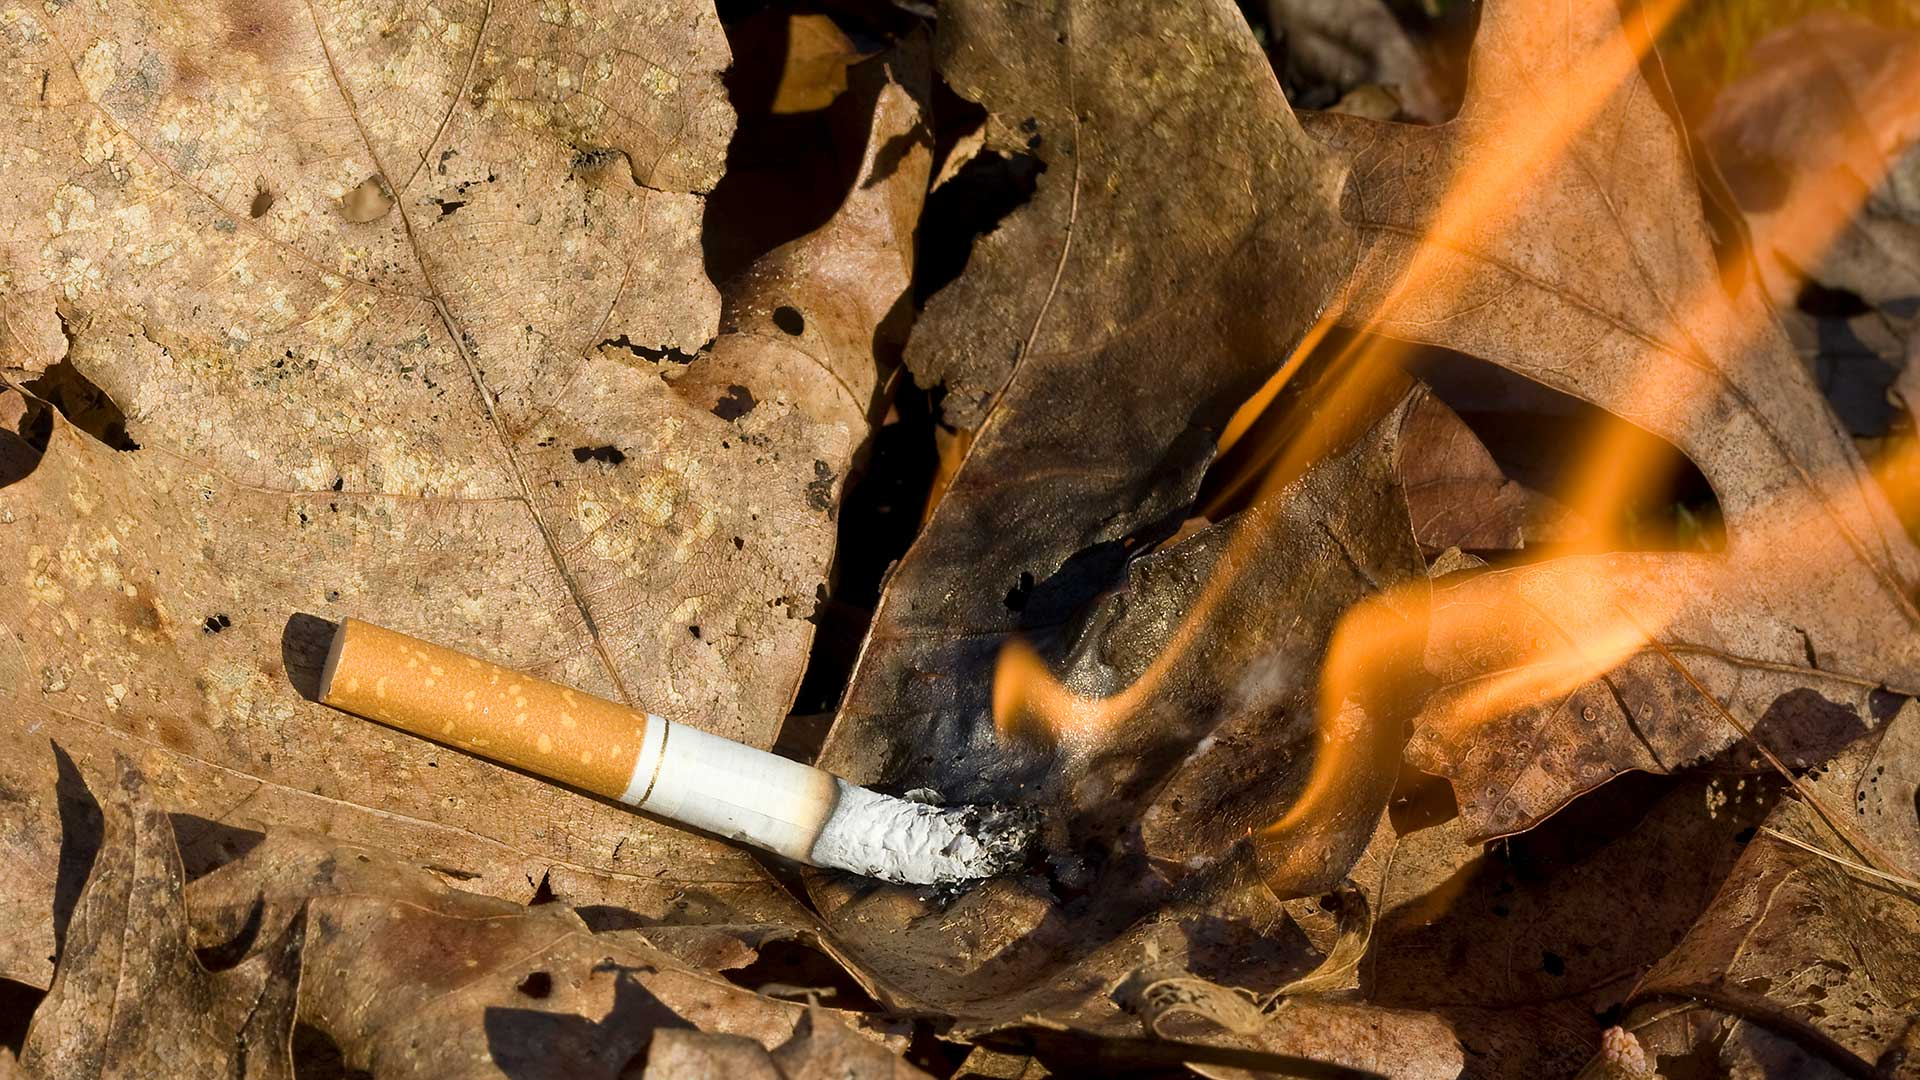 Achtlos weggeworfene Zigarettenkippen zählen zu den häufigsten Brandauslösern. © chrisroselli / iStock / Getty Images